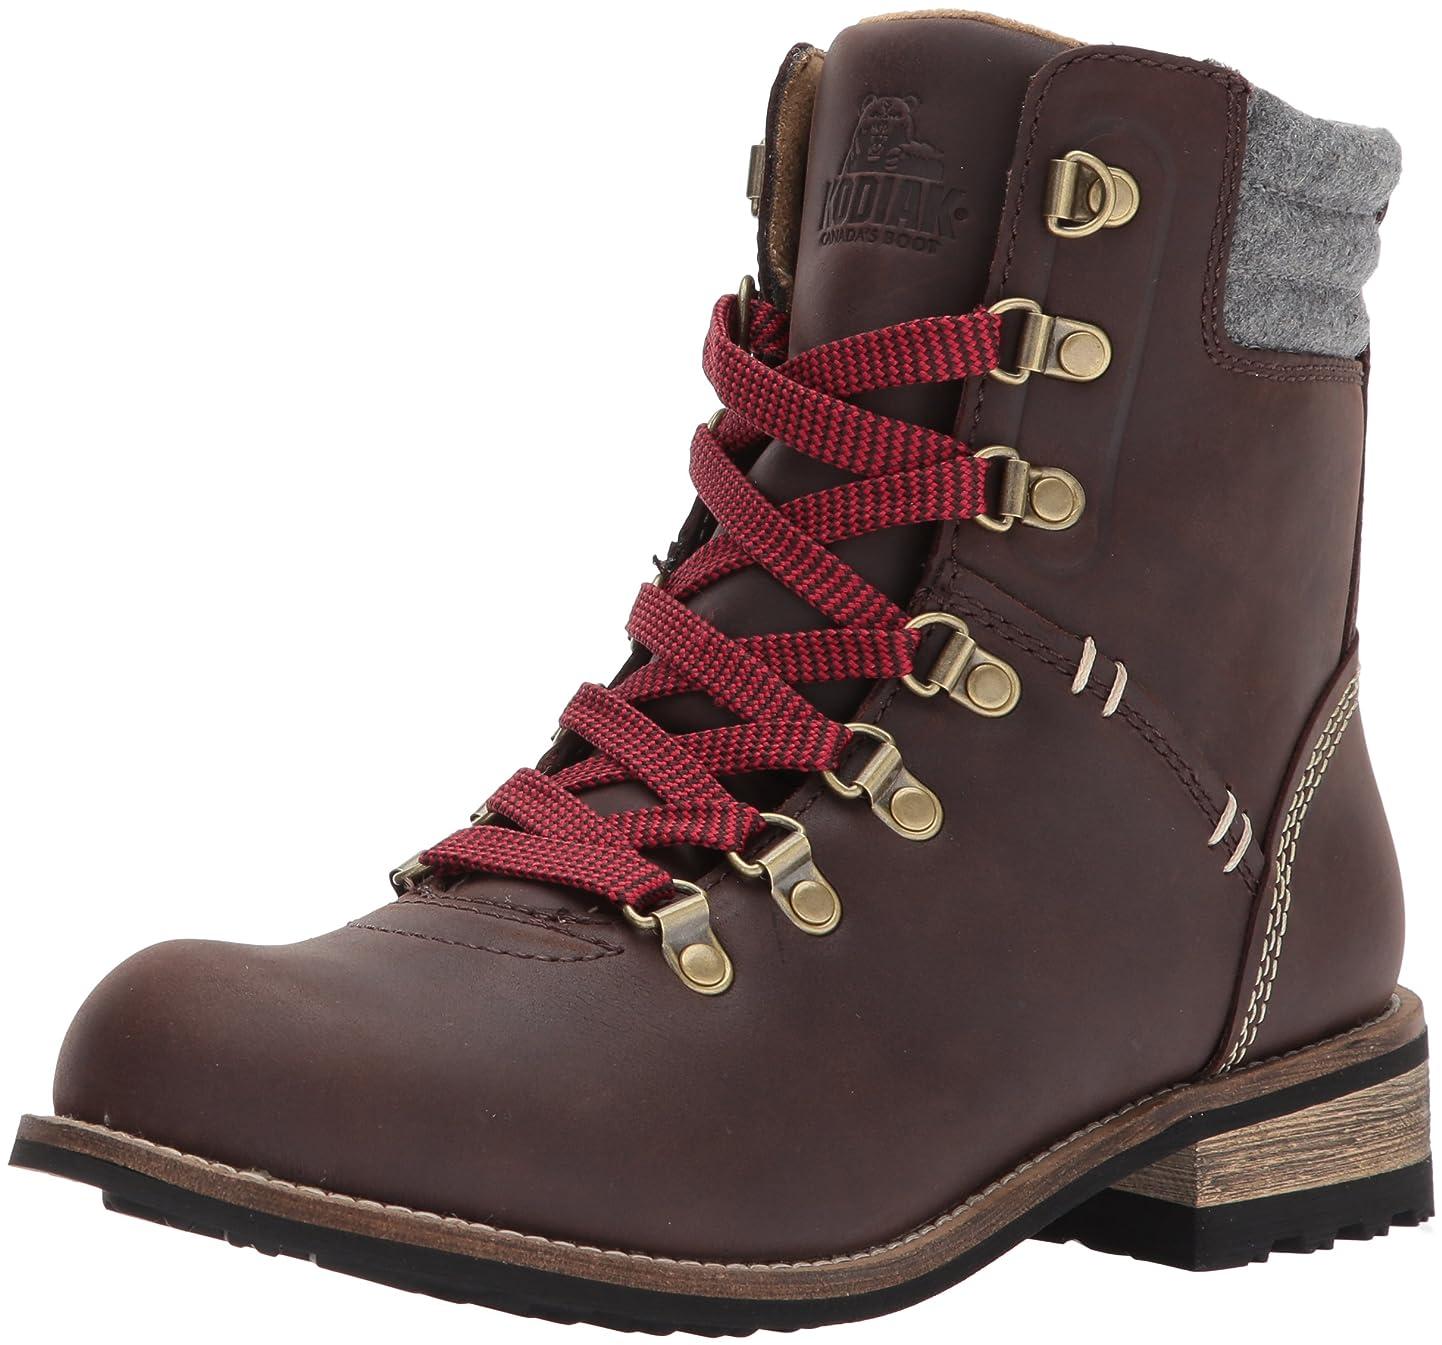 Kodiak Women's Surrey II Hiking Boot yeuqynhwngr5